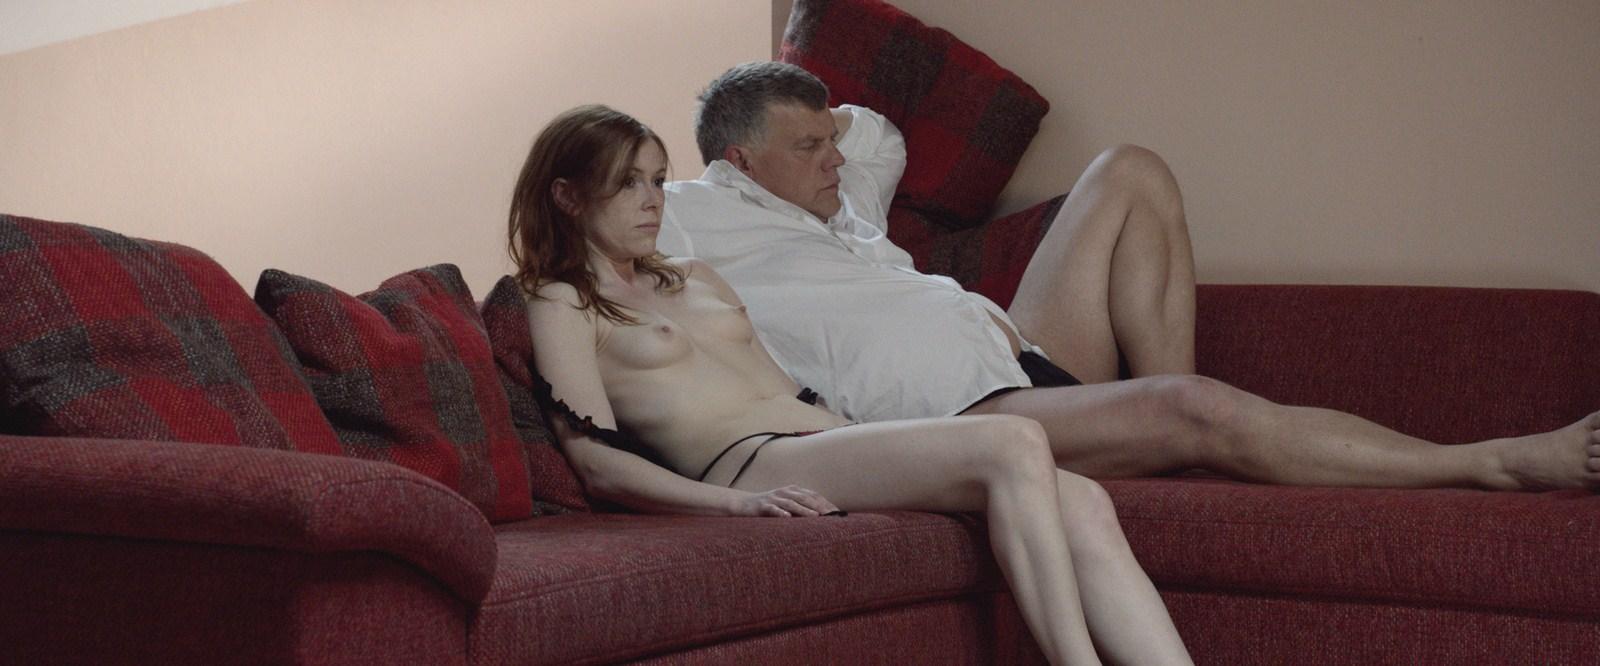 Sexfilme & Bilder GRATIS Eros center hamm